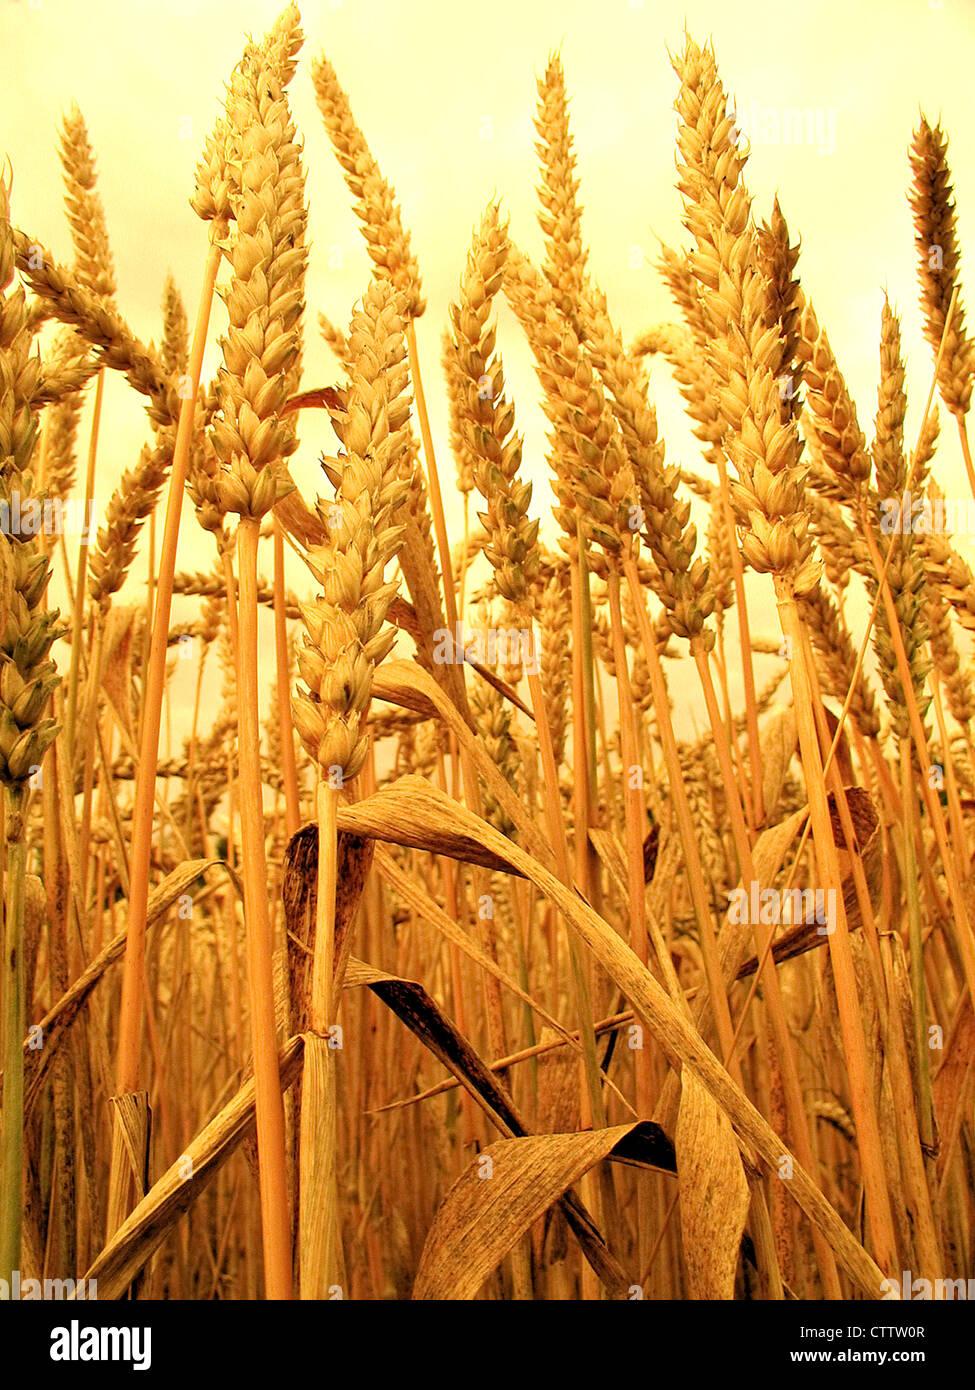 Wheat - Weizenähren - Stock Image